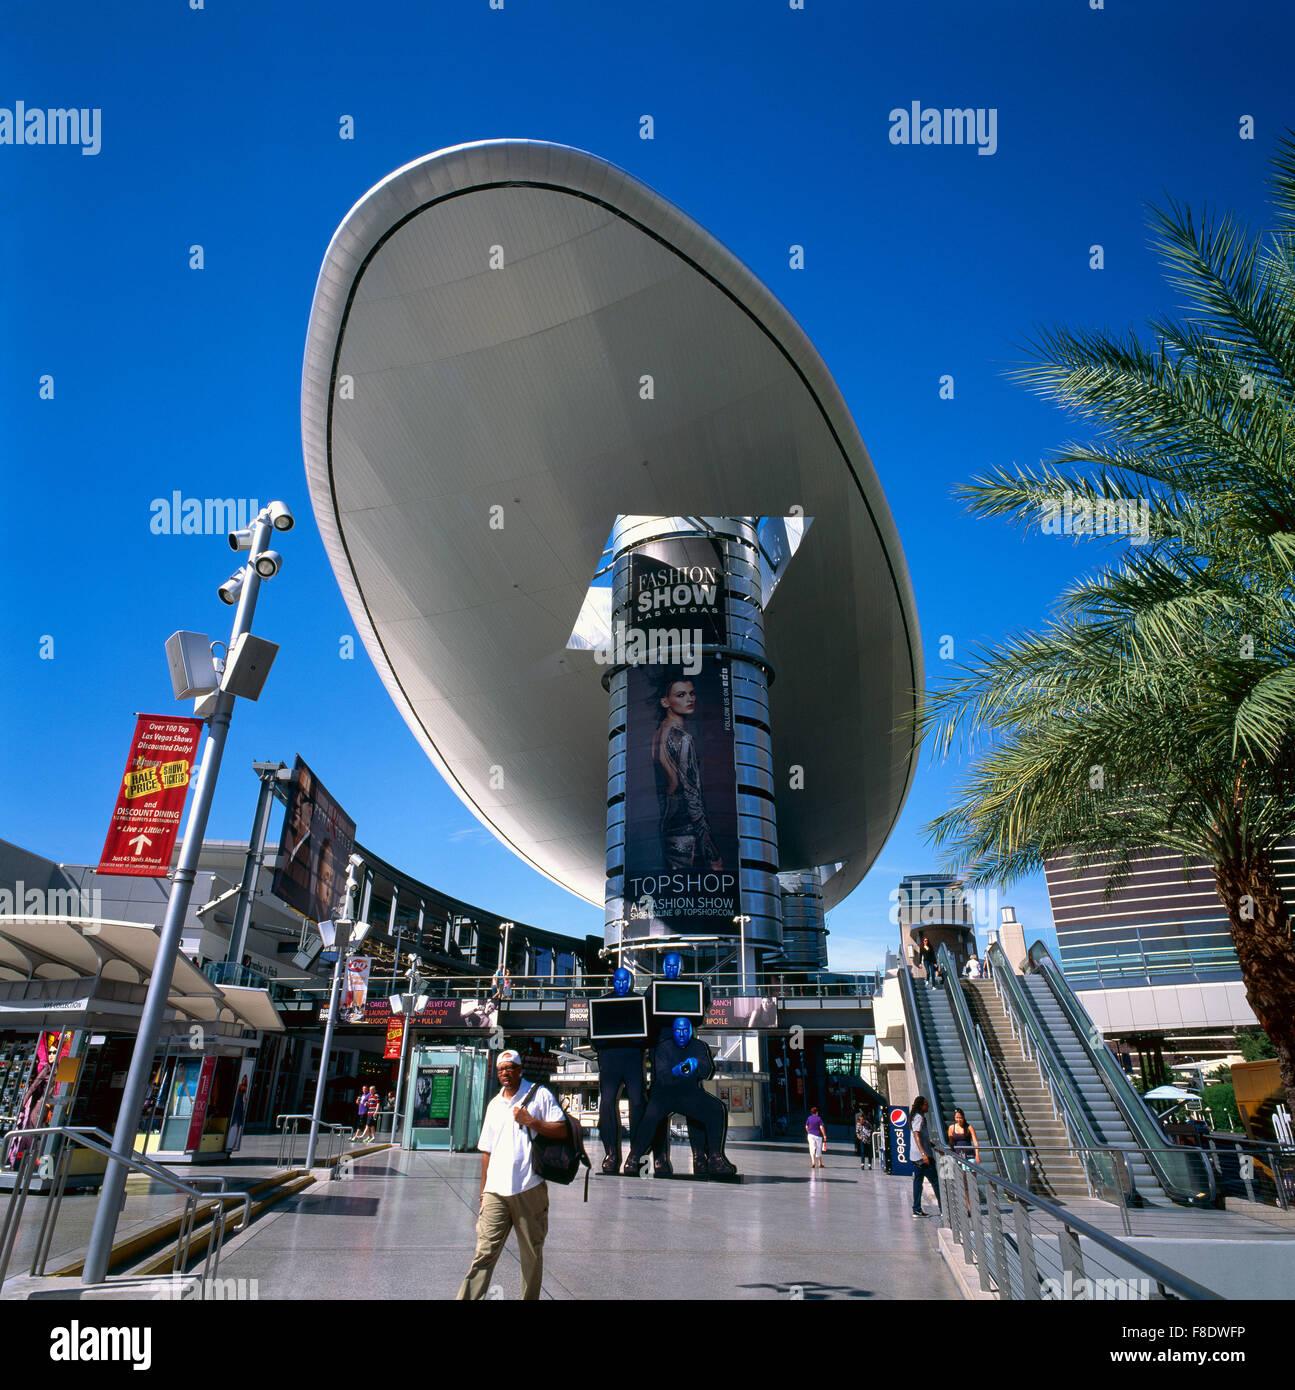 Las Vegas Nevada USA - Fashion Show Mall along The Strip (Las Vegas Boulevard) - Oval-shaped Canopy known as The Cloud & Las Vegas Nevada USA - Fashion Show Mall along The Strip (Las ...